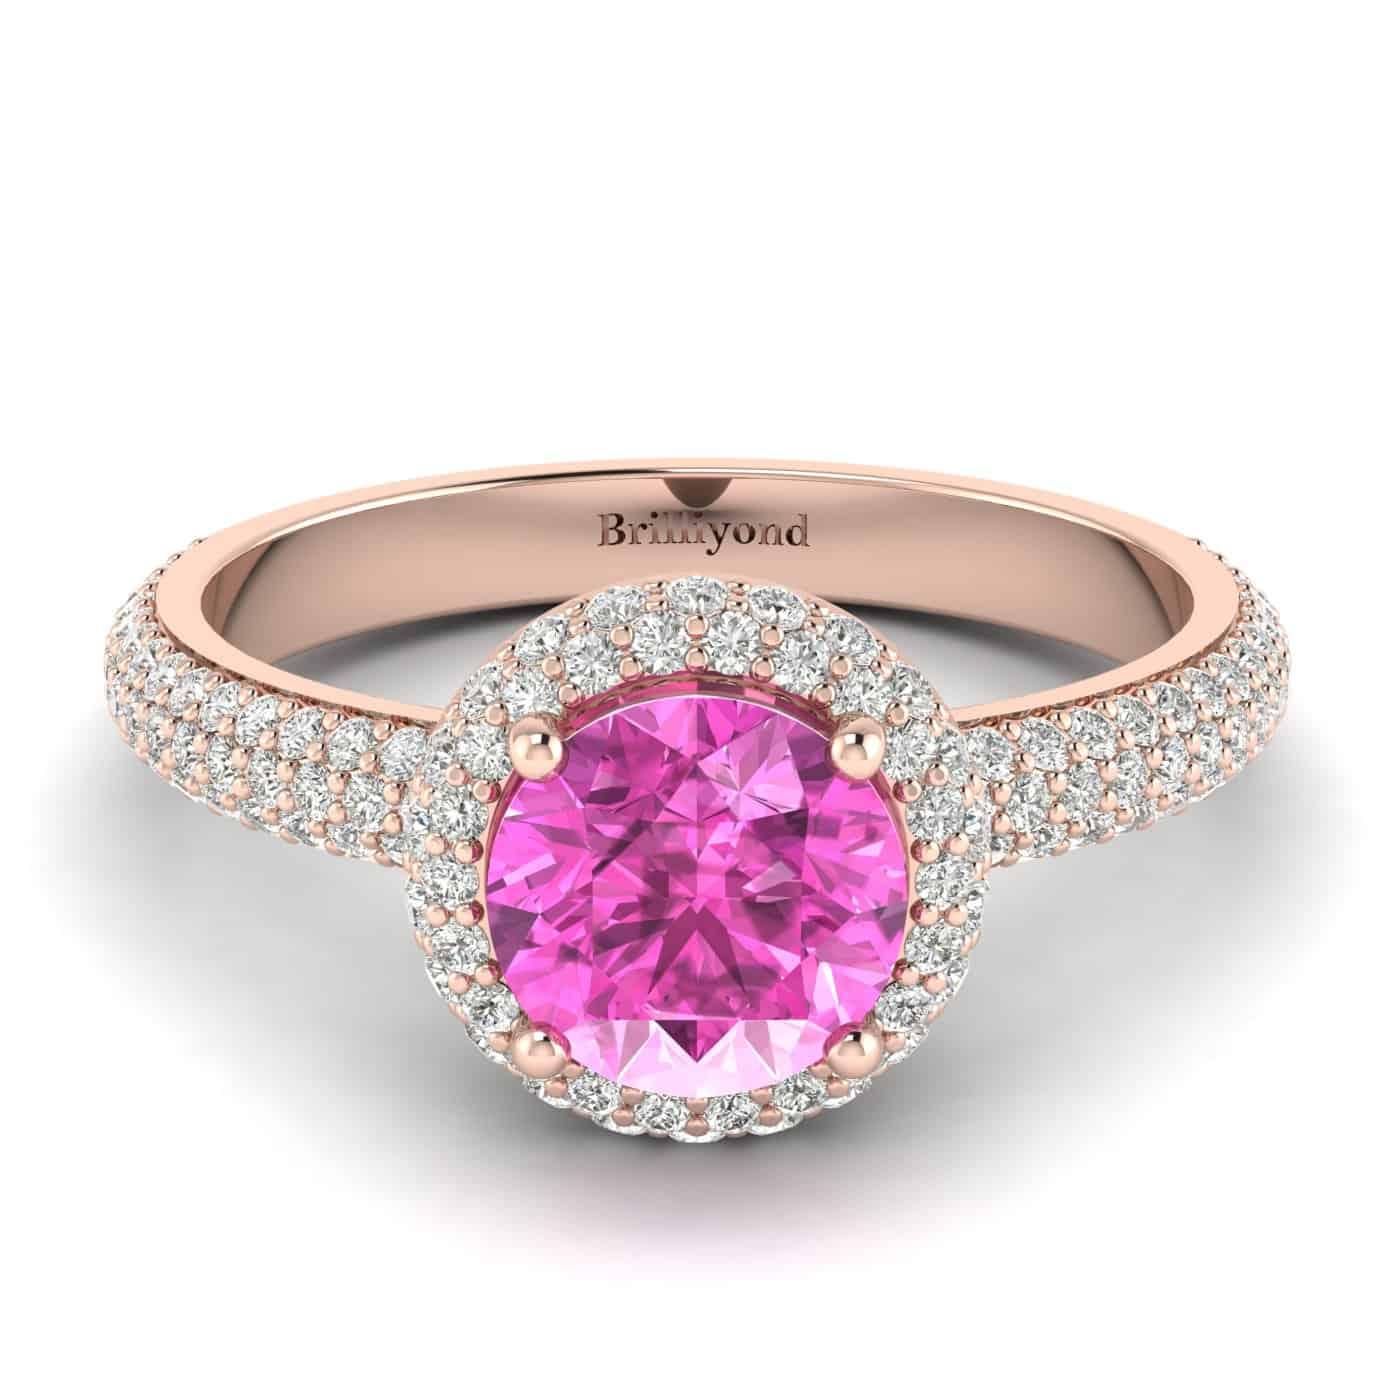 Best Pink Sapphire Jewellery with Gemstones in Sydney